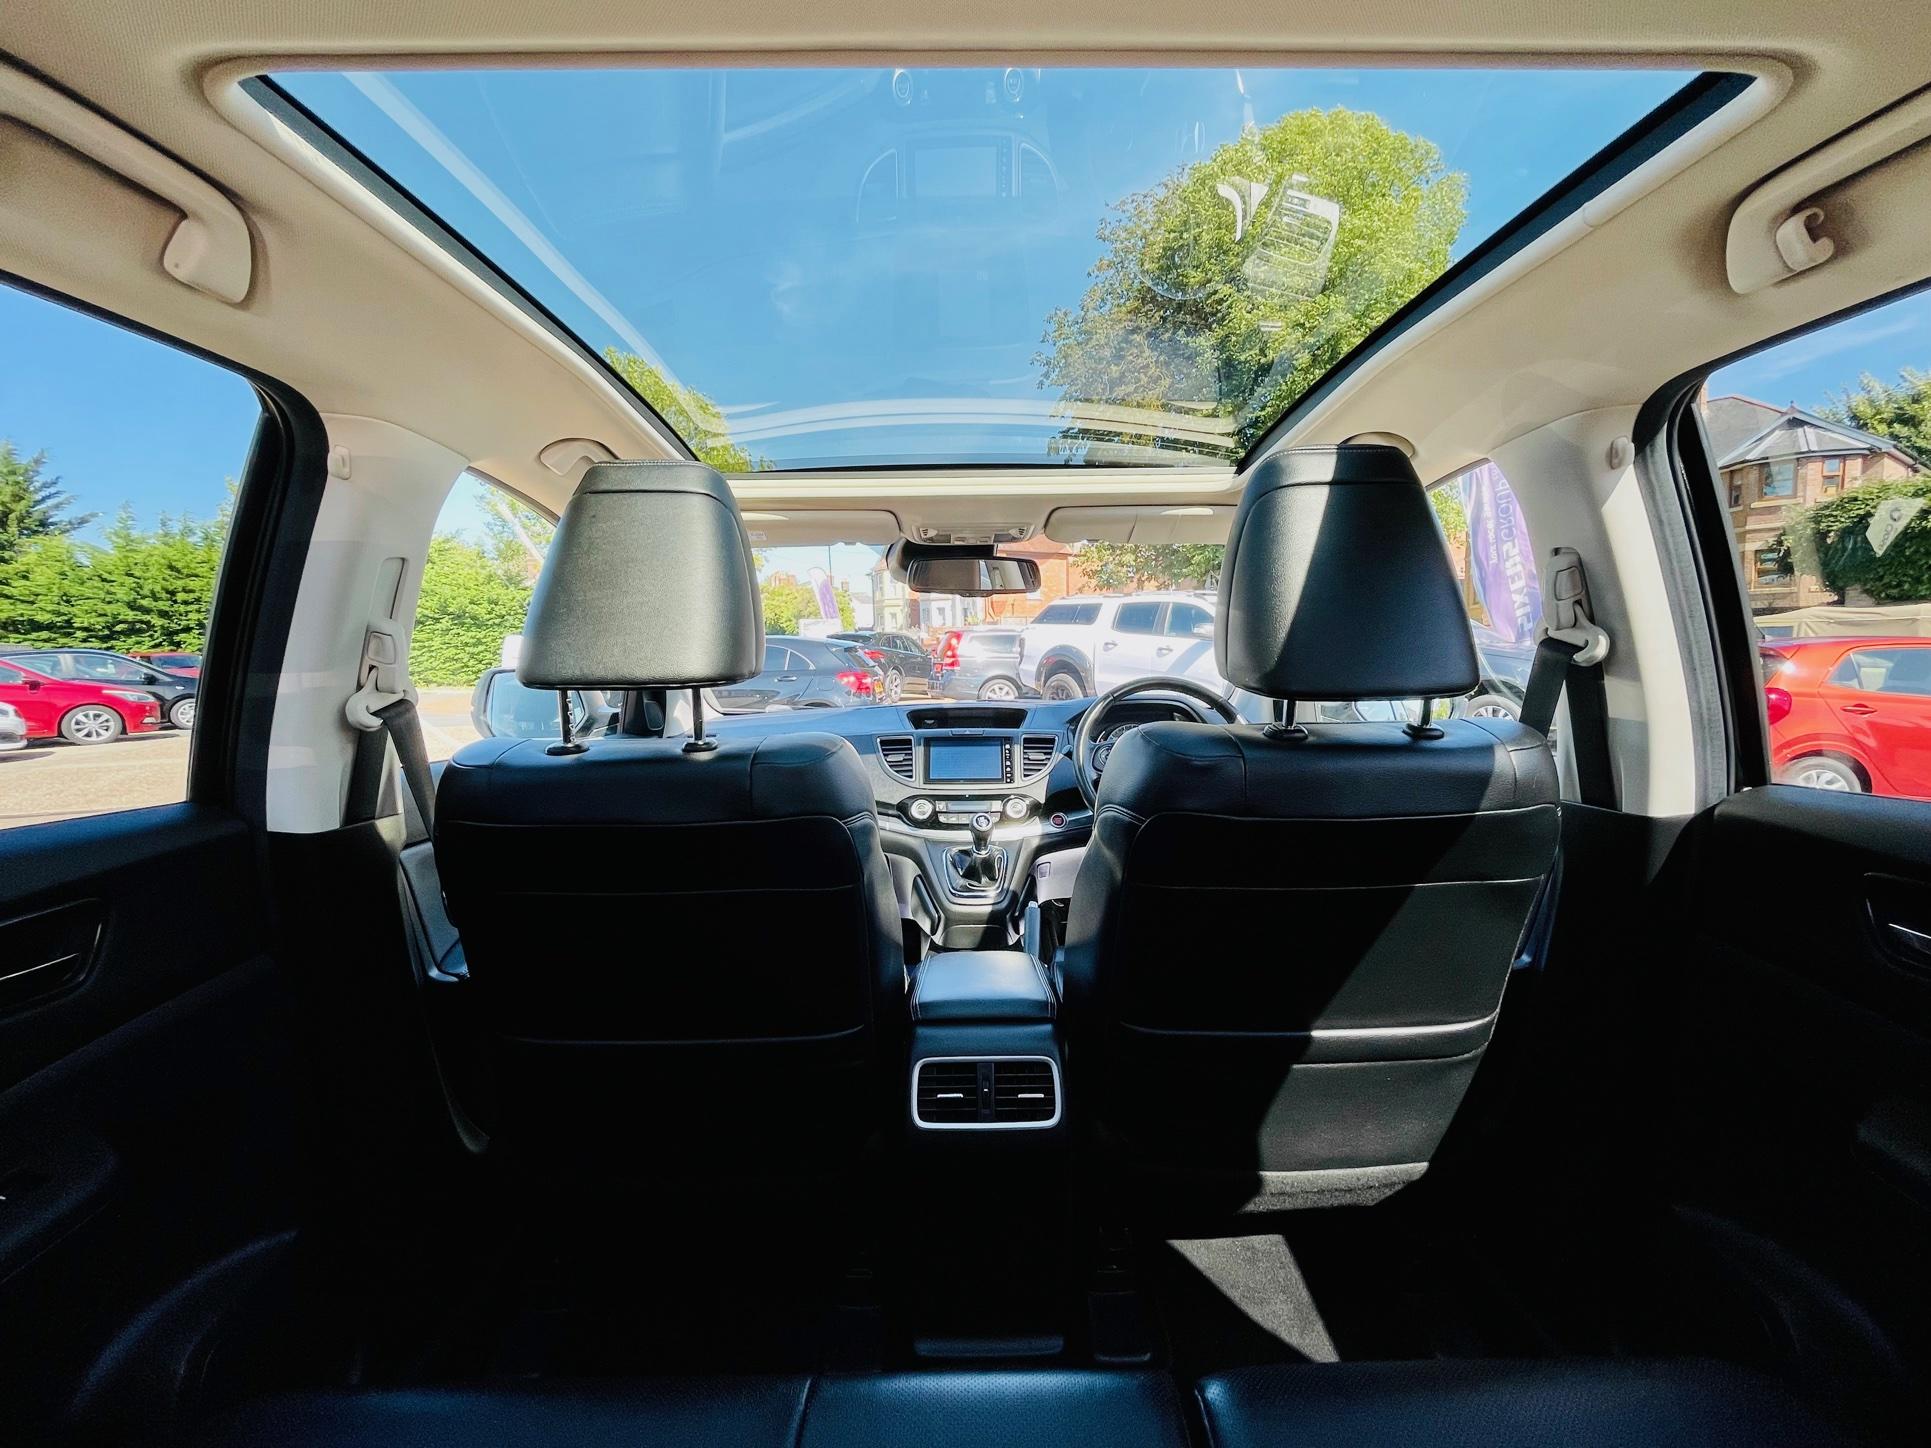 Car For Sale Honda CRV - FX66BUU Sixers Group Image #8